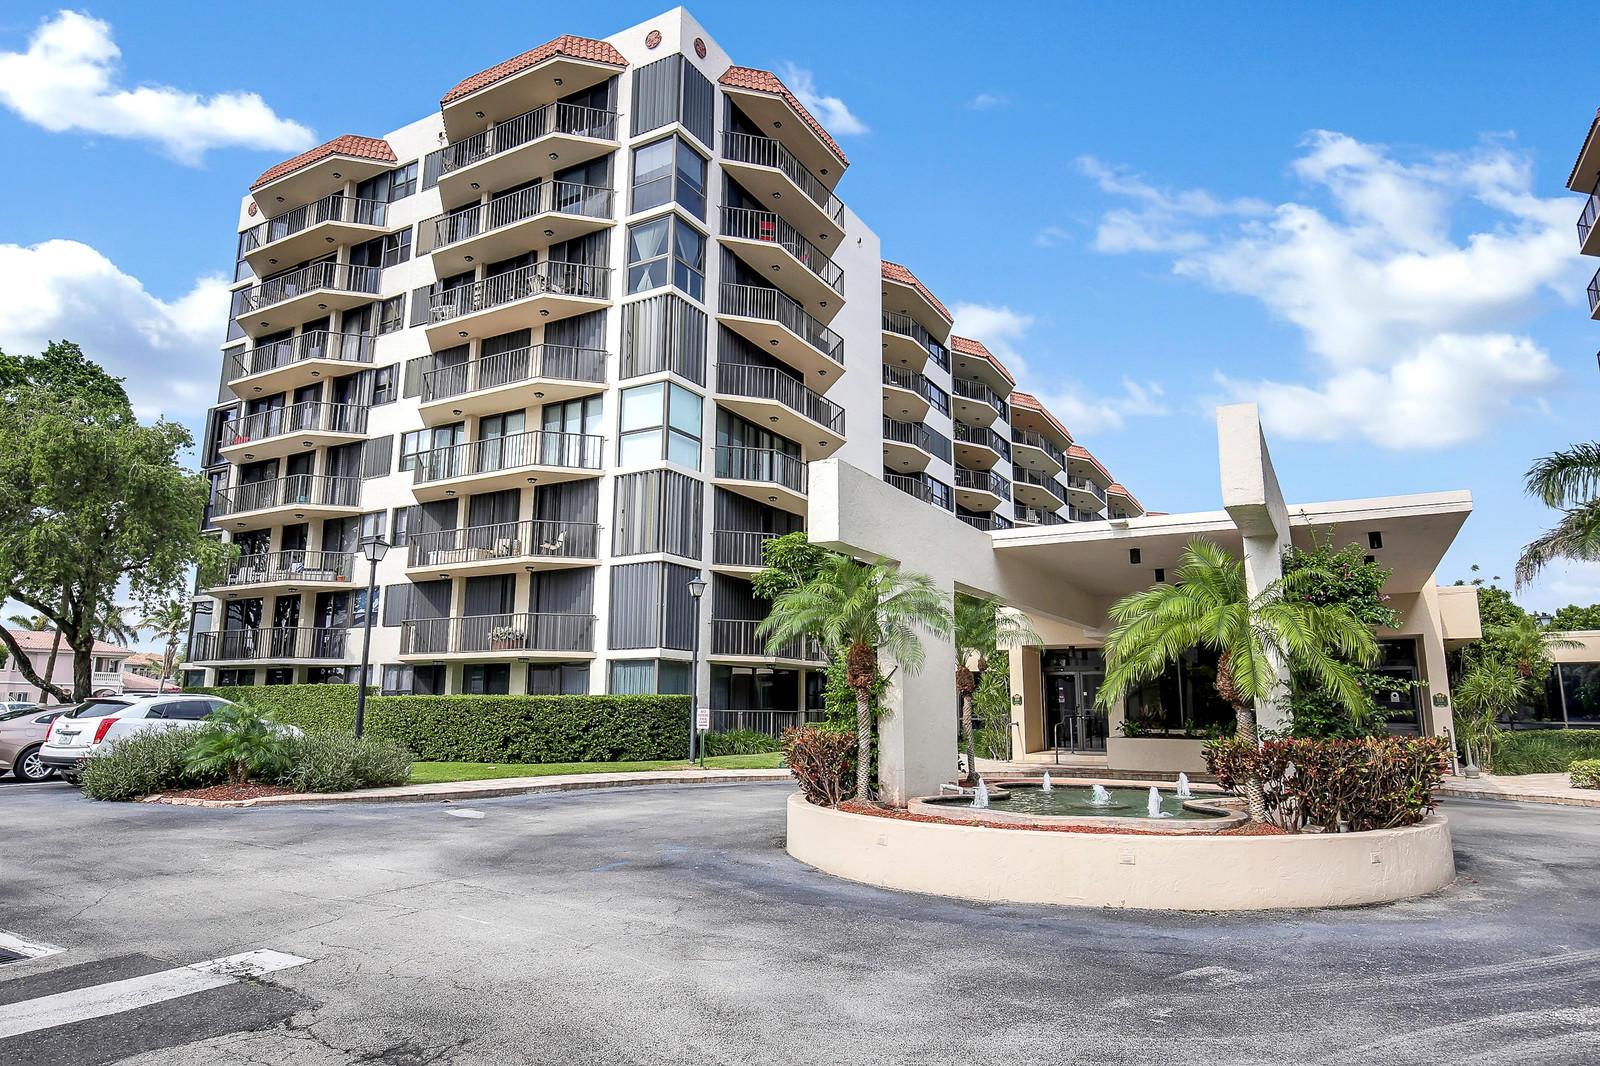 899 Jeffery Street, Boca Raton, Florida 33487, 2 Bedrooms Bedrooms, ,2 BathroomsBathrooms,Condo/Coop,For Sale,Porta Bella Yacht and Tennis,Jeffery,6,RX-10438077